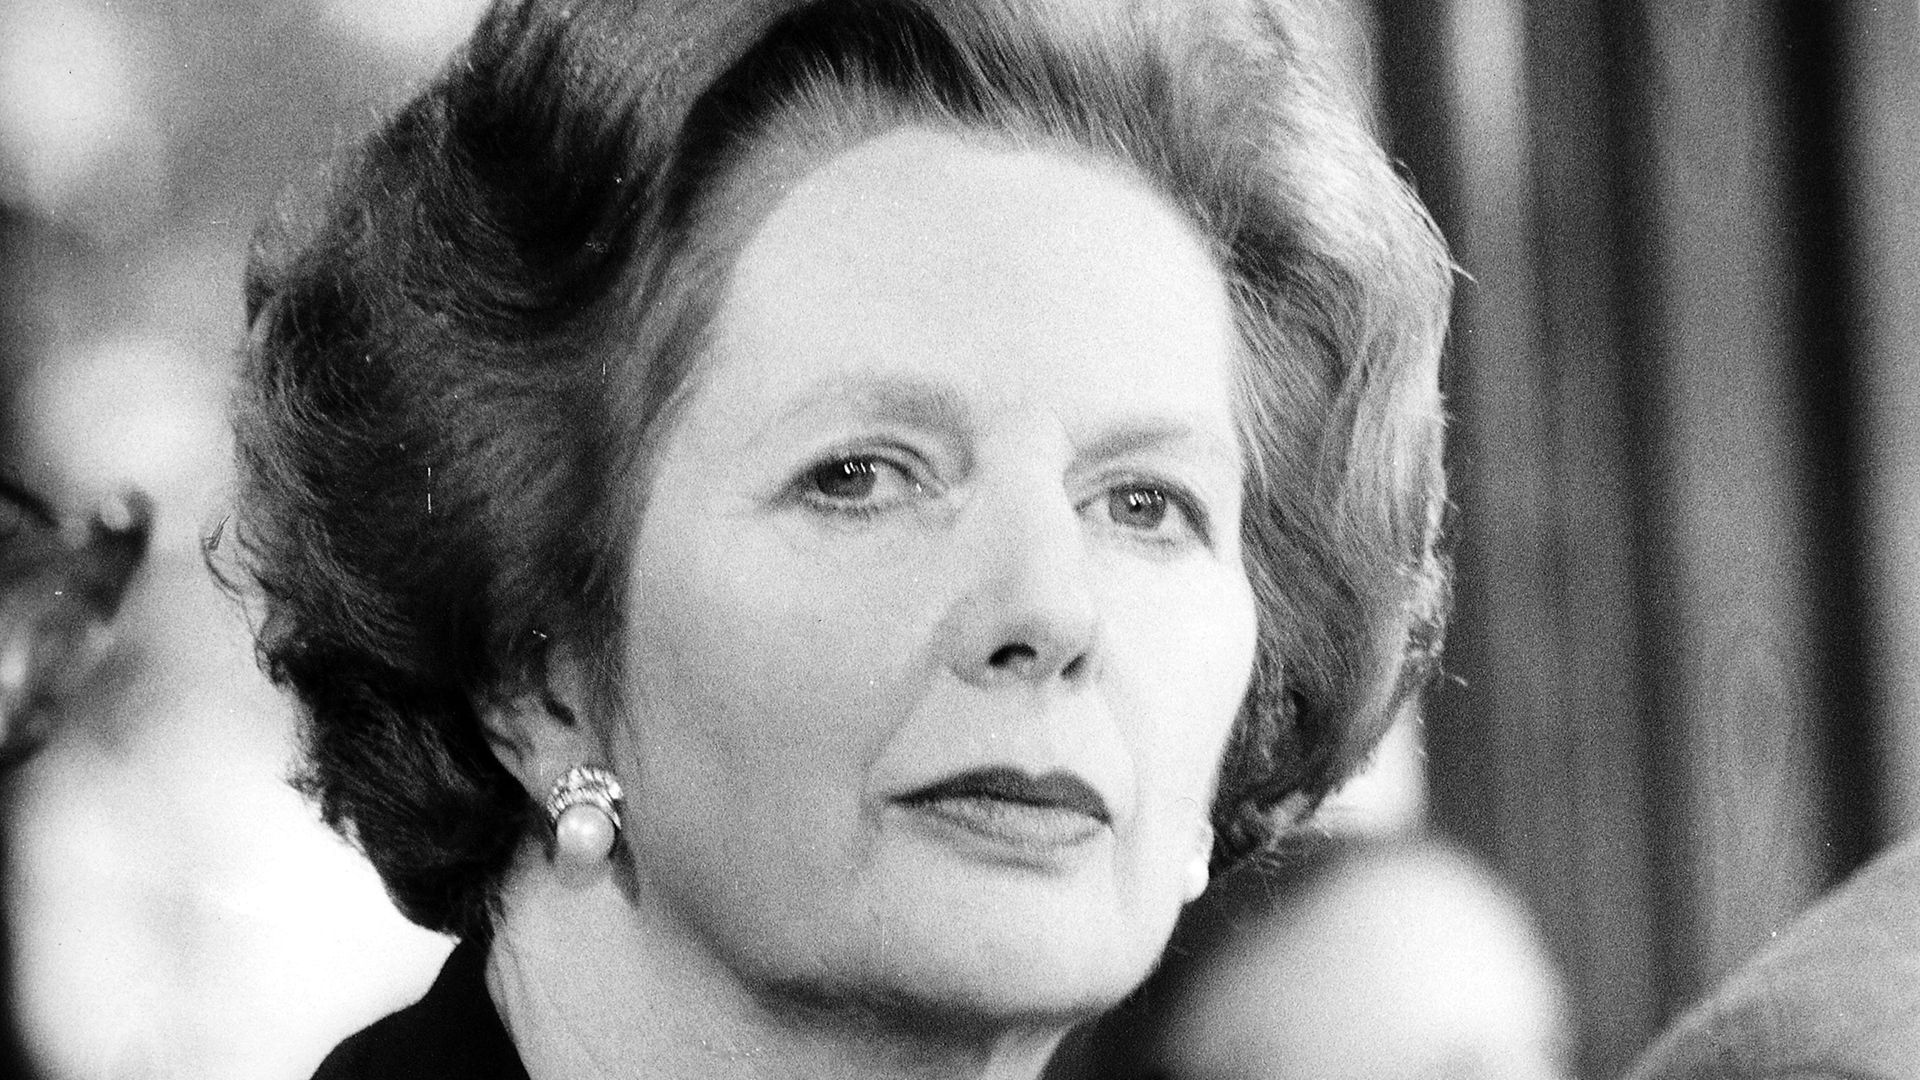 Former prime minister Margaret Thatcher - Credit: Knippertz/ullstein bild via Getty Images